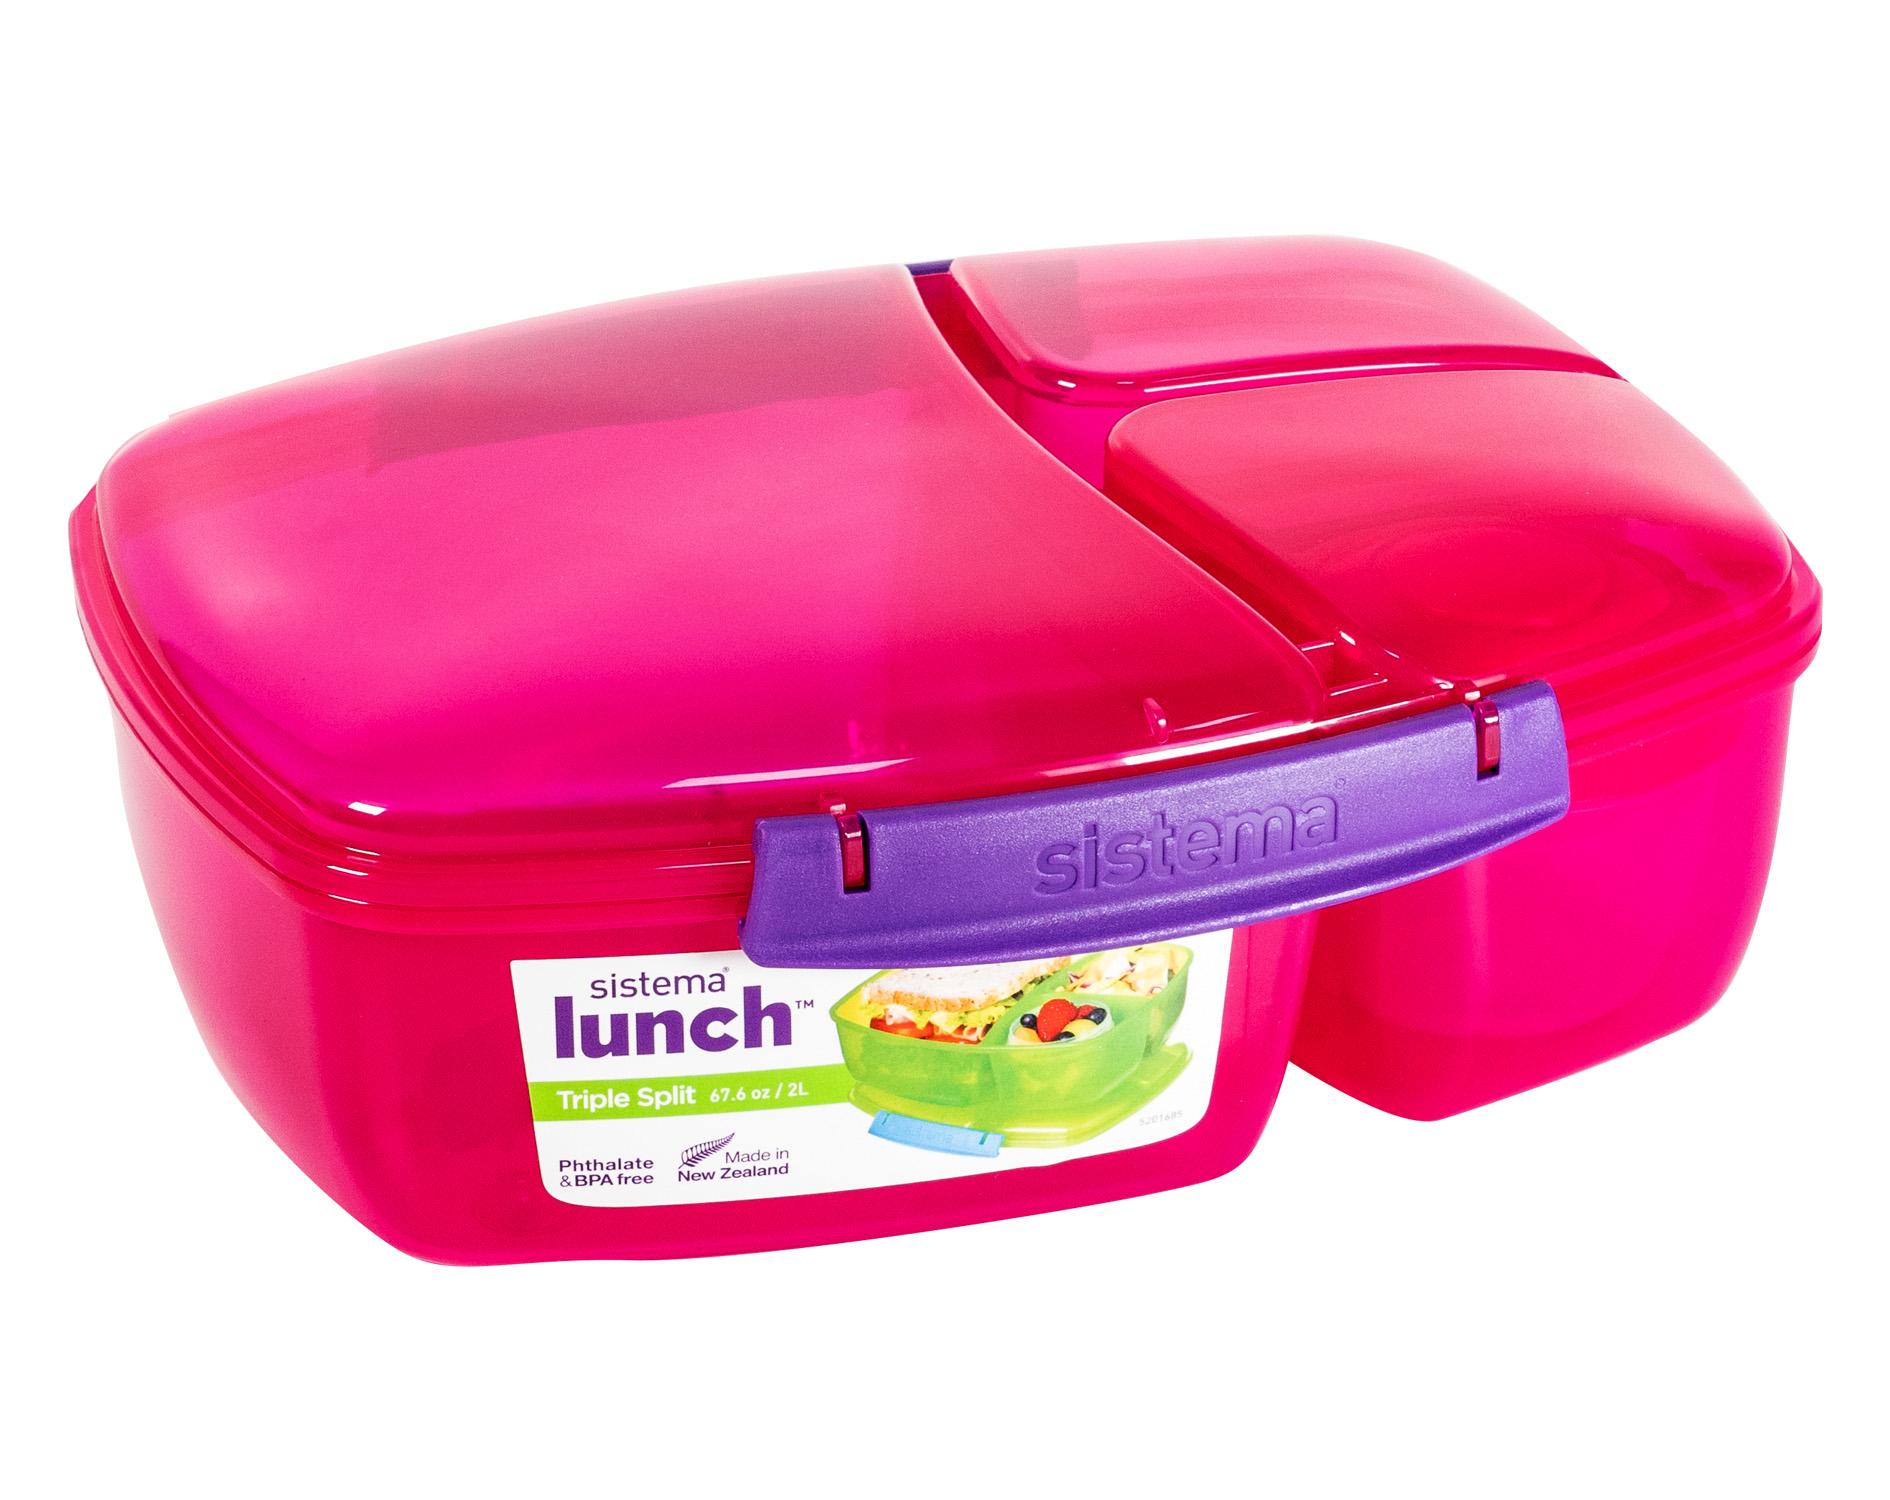 Lunchbox Brotdose Snack Box sistema Triple Split 3-fach unterteilt mit Joghurttopf 2L